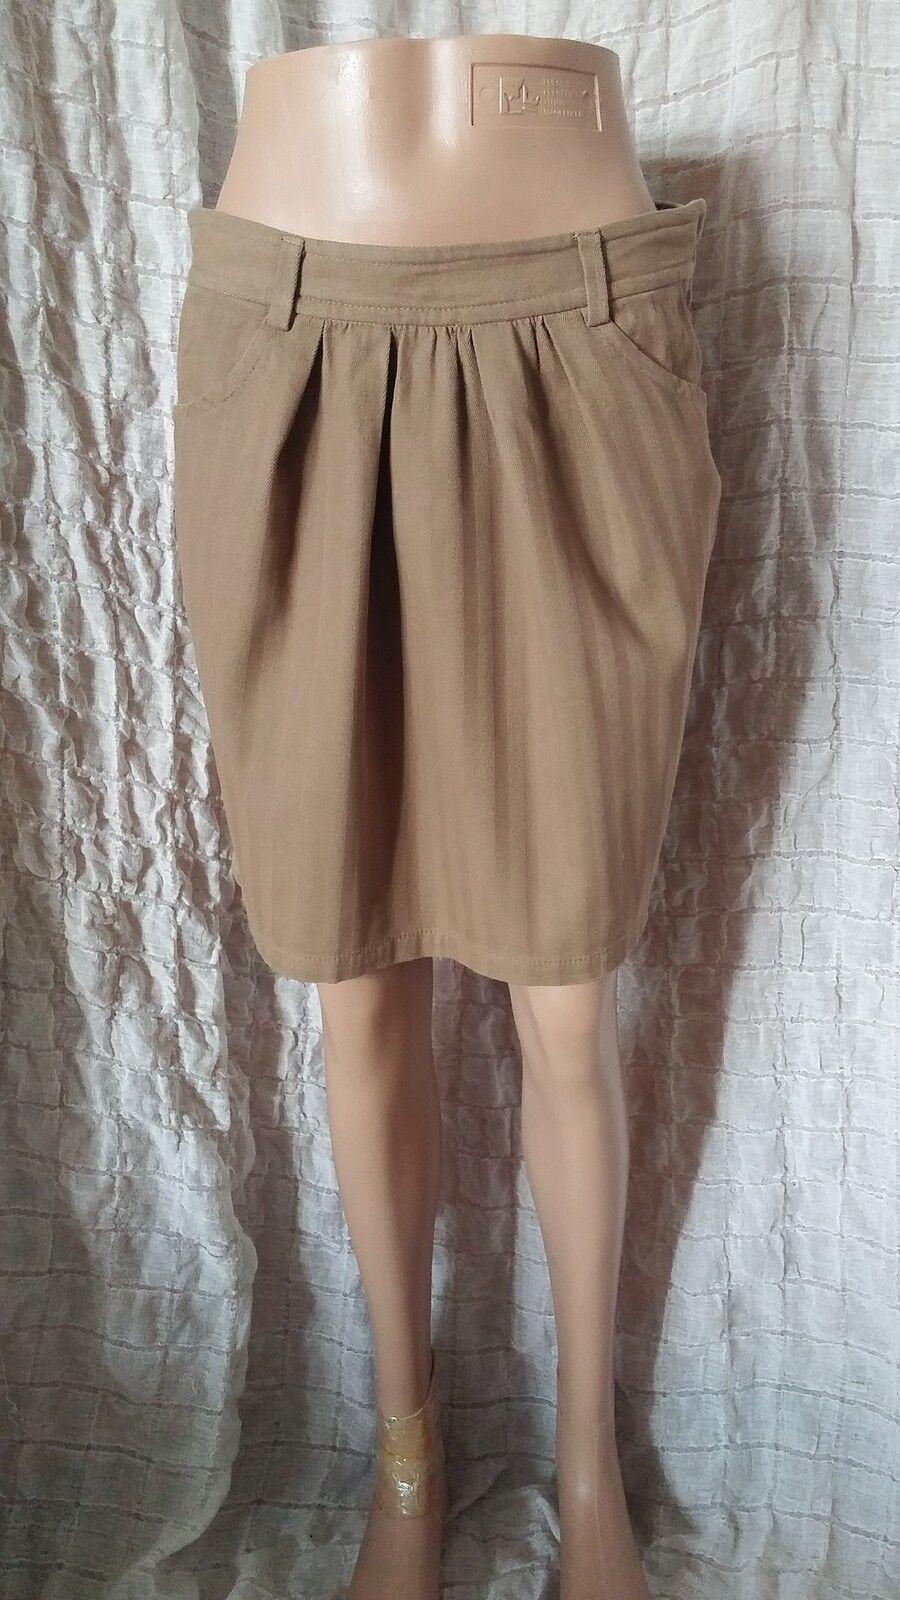 Isabel Marant Etoile textured  brown khaki tulip mini skirt size 1